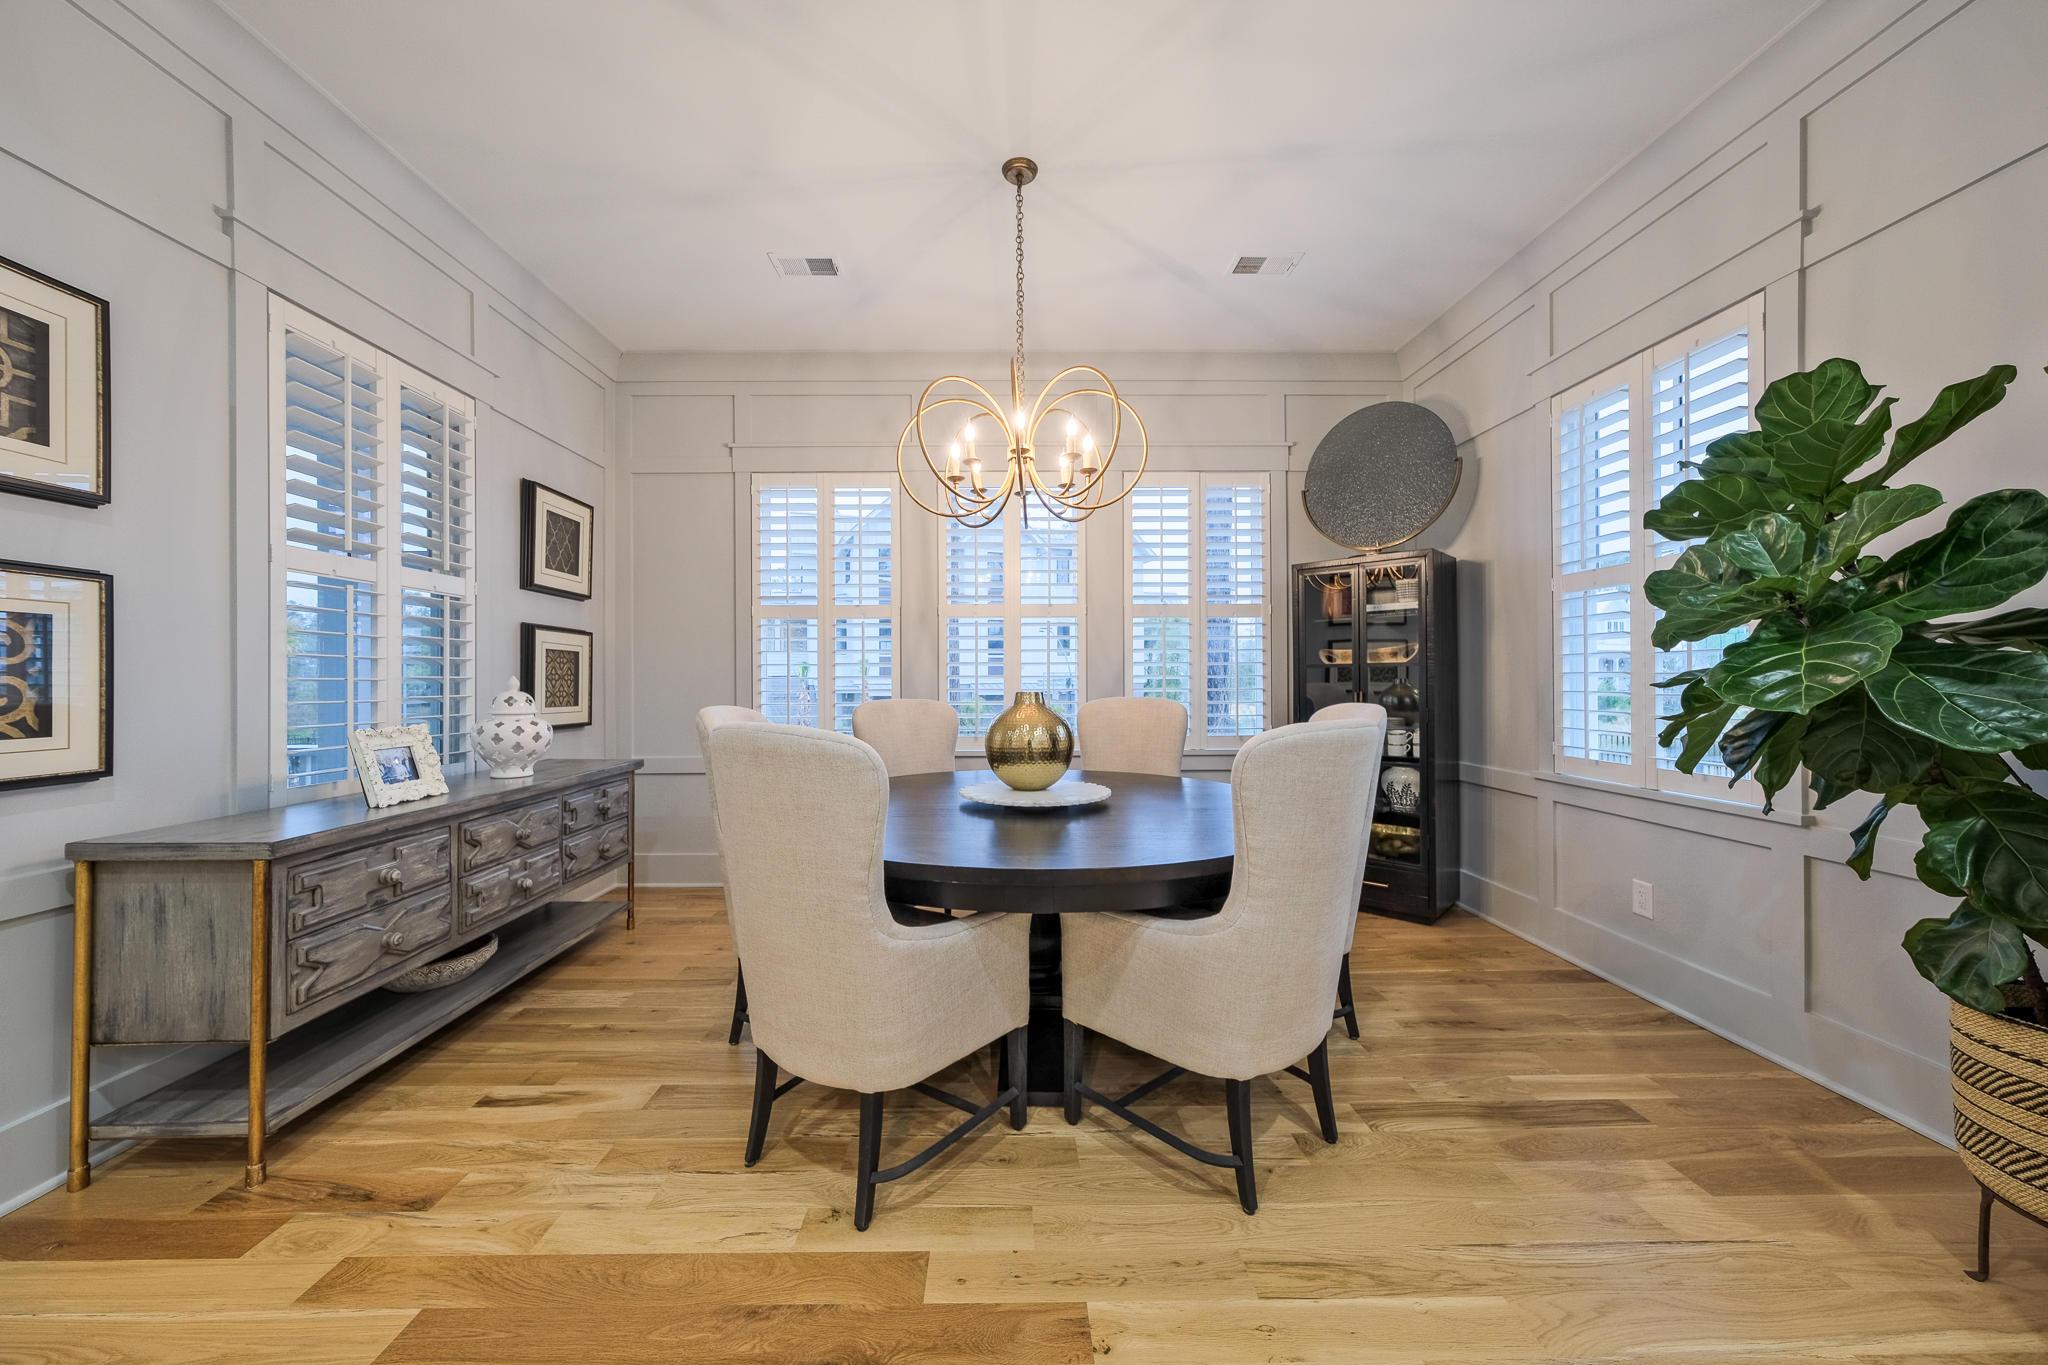 Daniel Island Park Homes For Sale - 208 Brailsford, Charleston, SC - 0